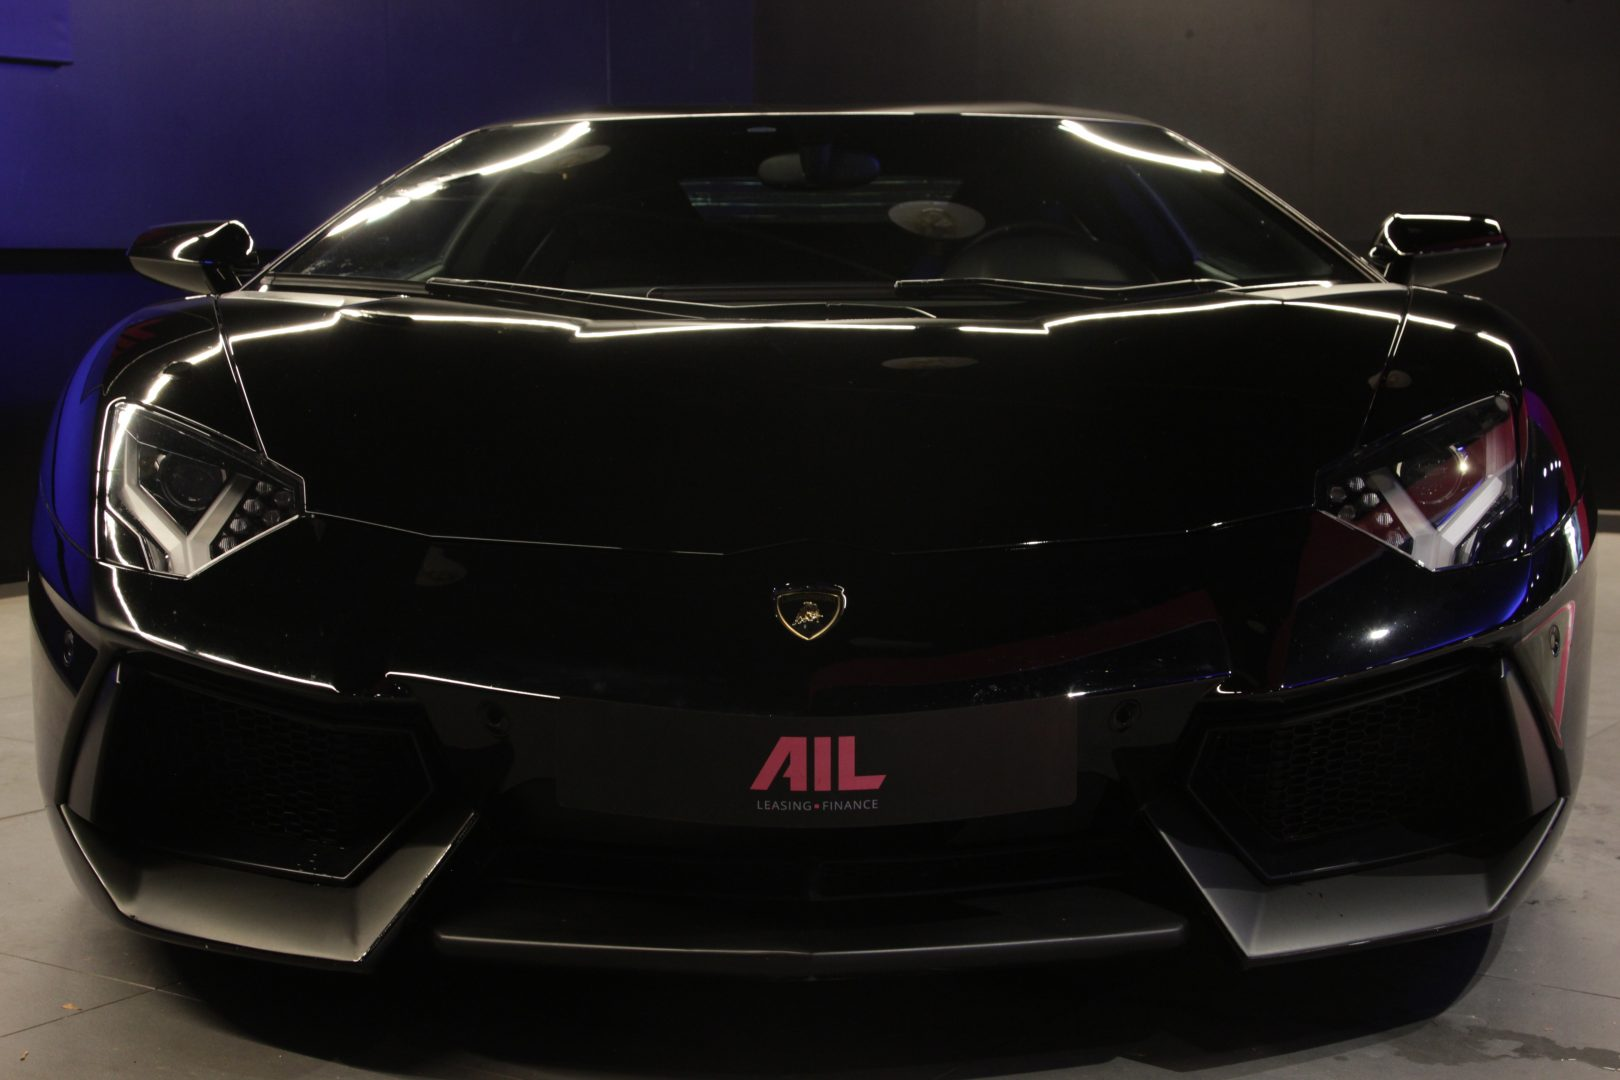 AIL Lamborghini Aventador LP 700-4 7